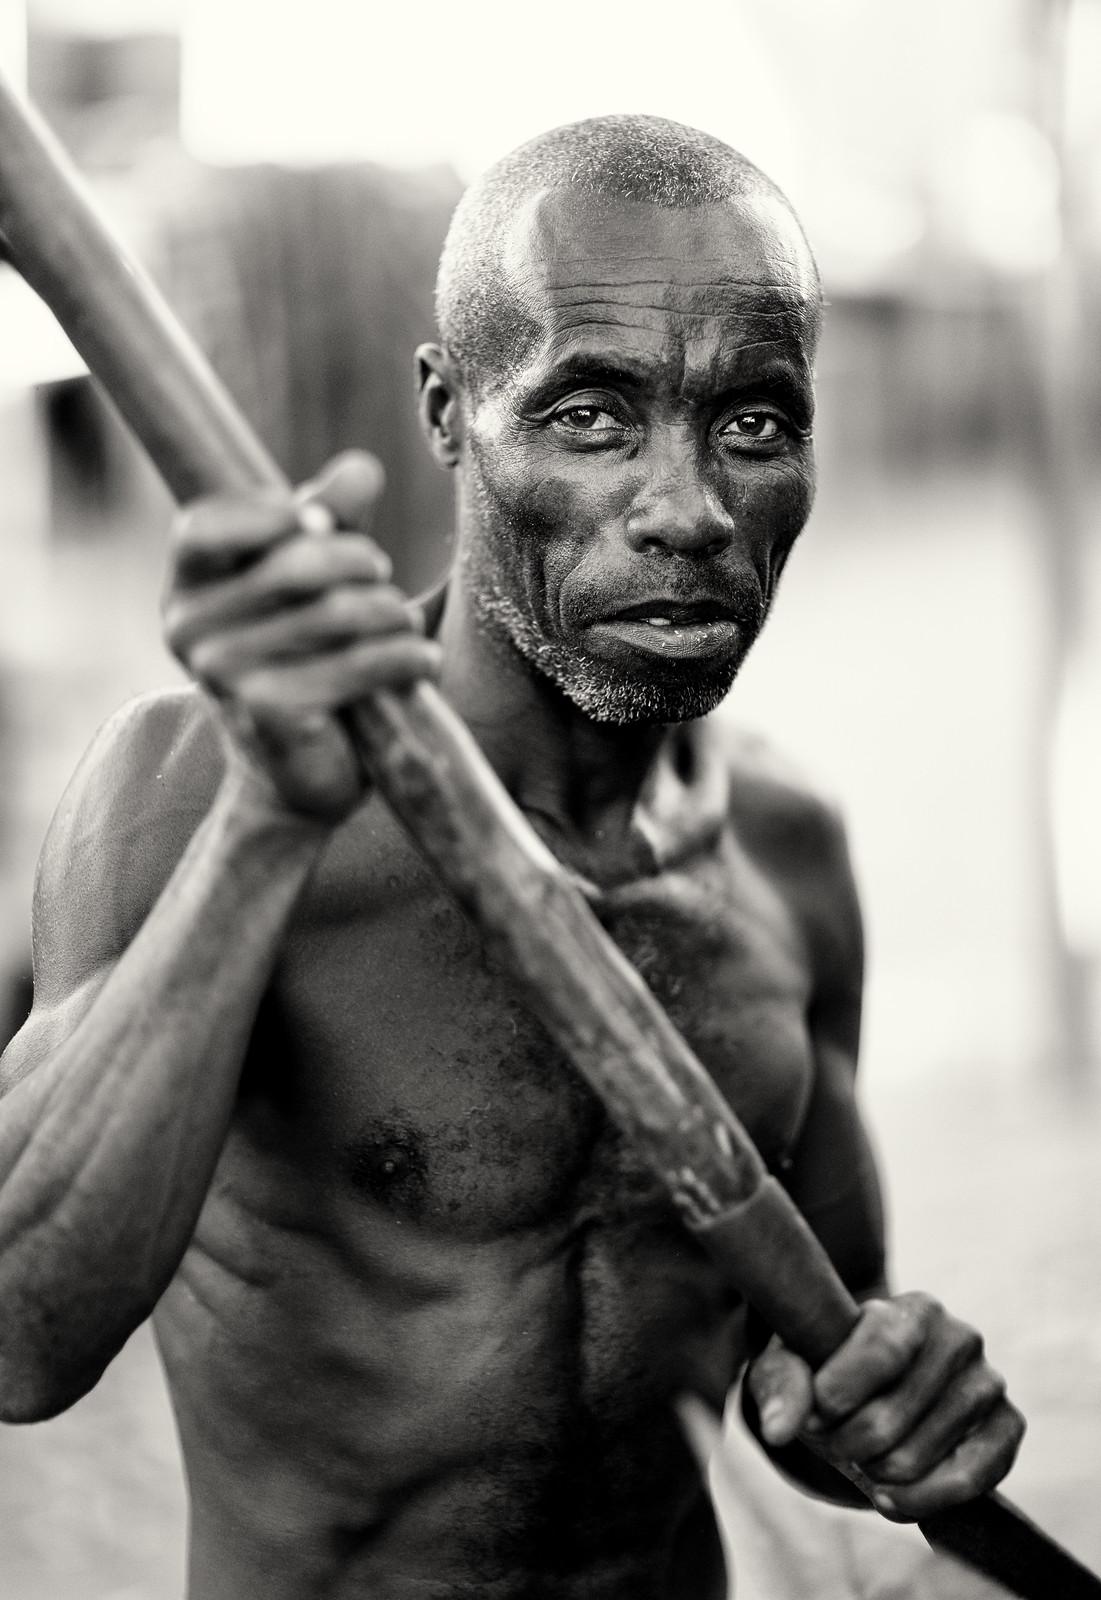 Madagascar, fisherman